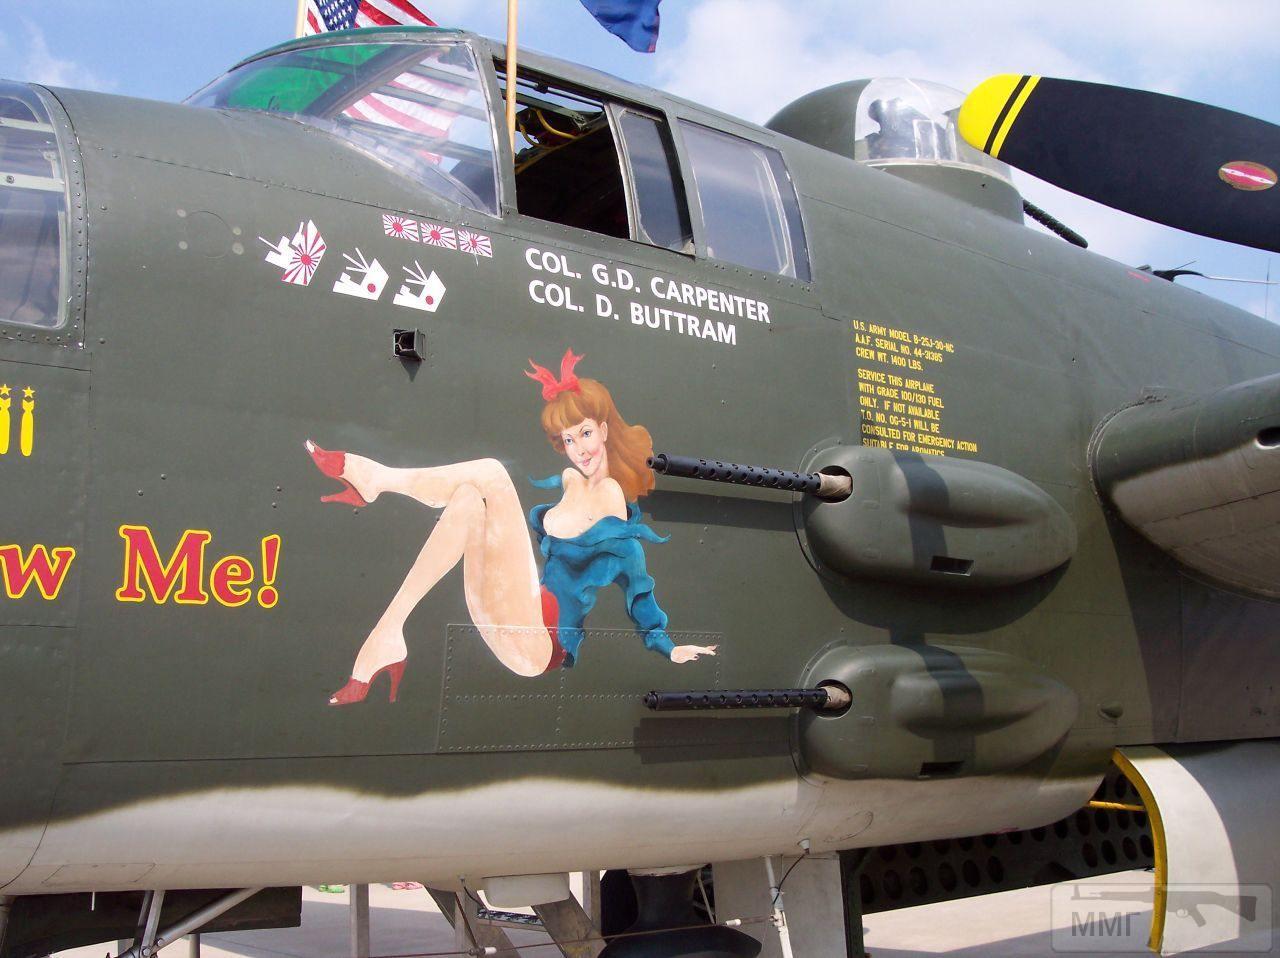 81151 - Первым делом, первым делом самолеты...